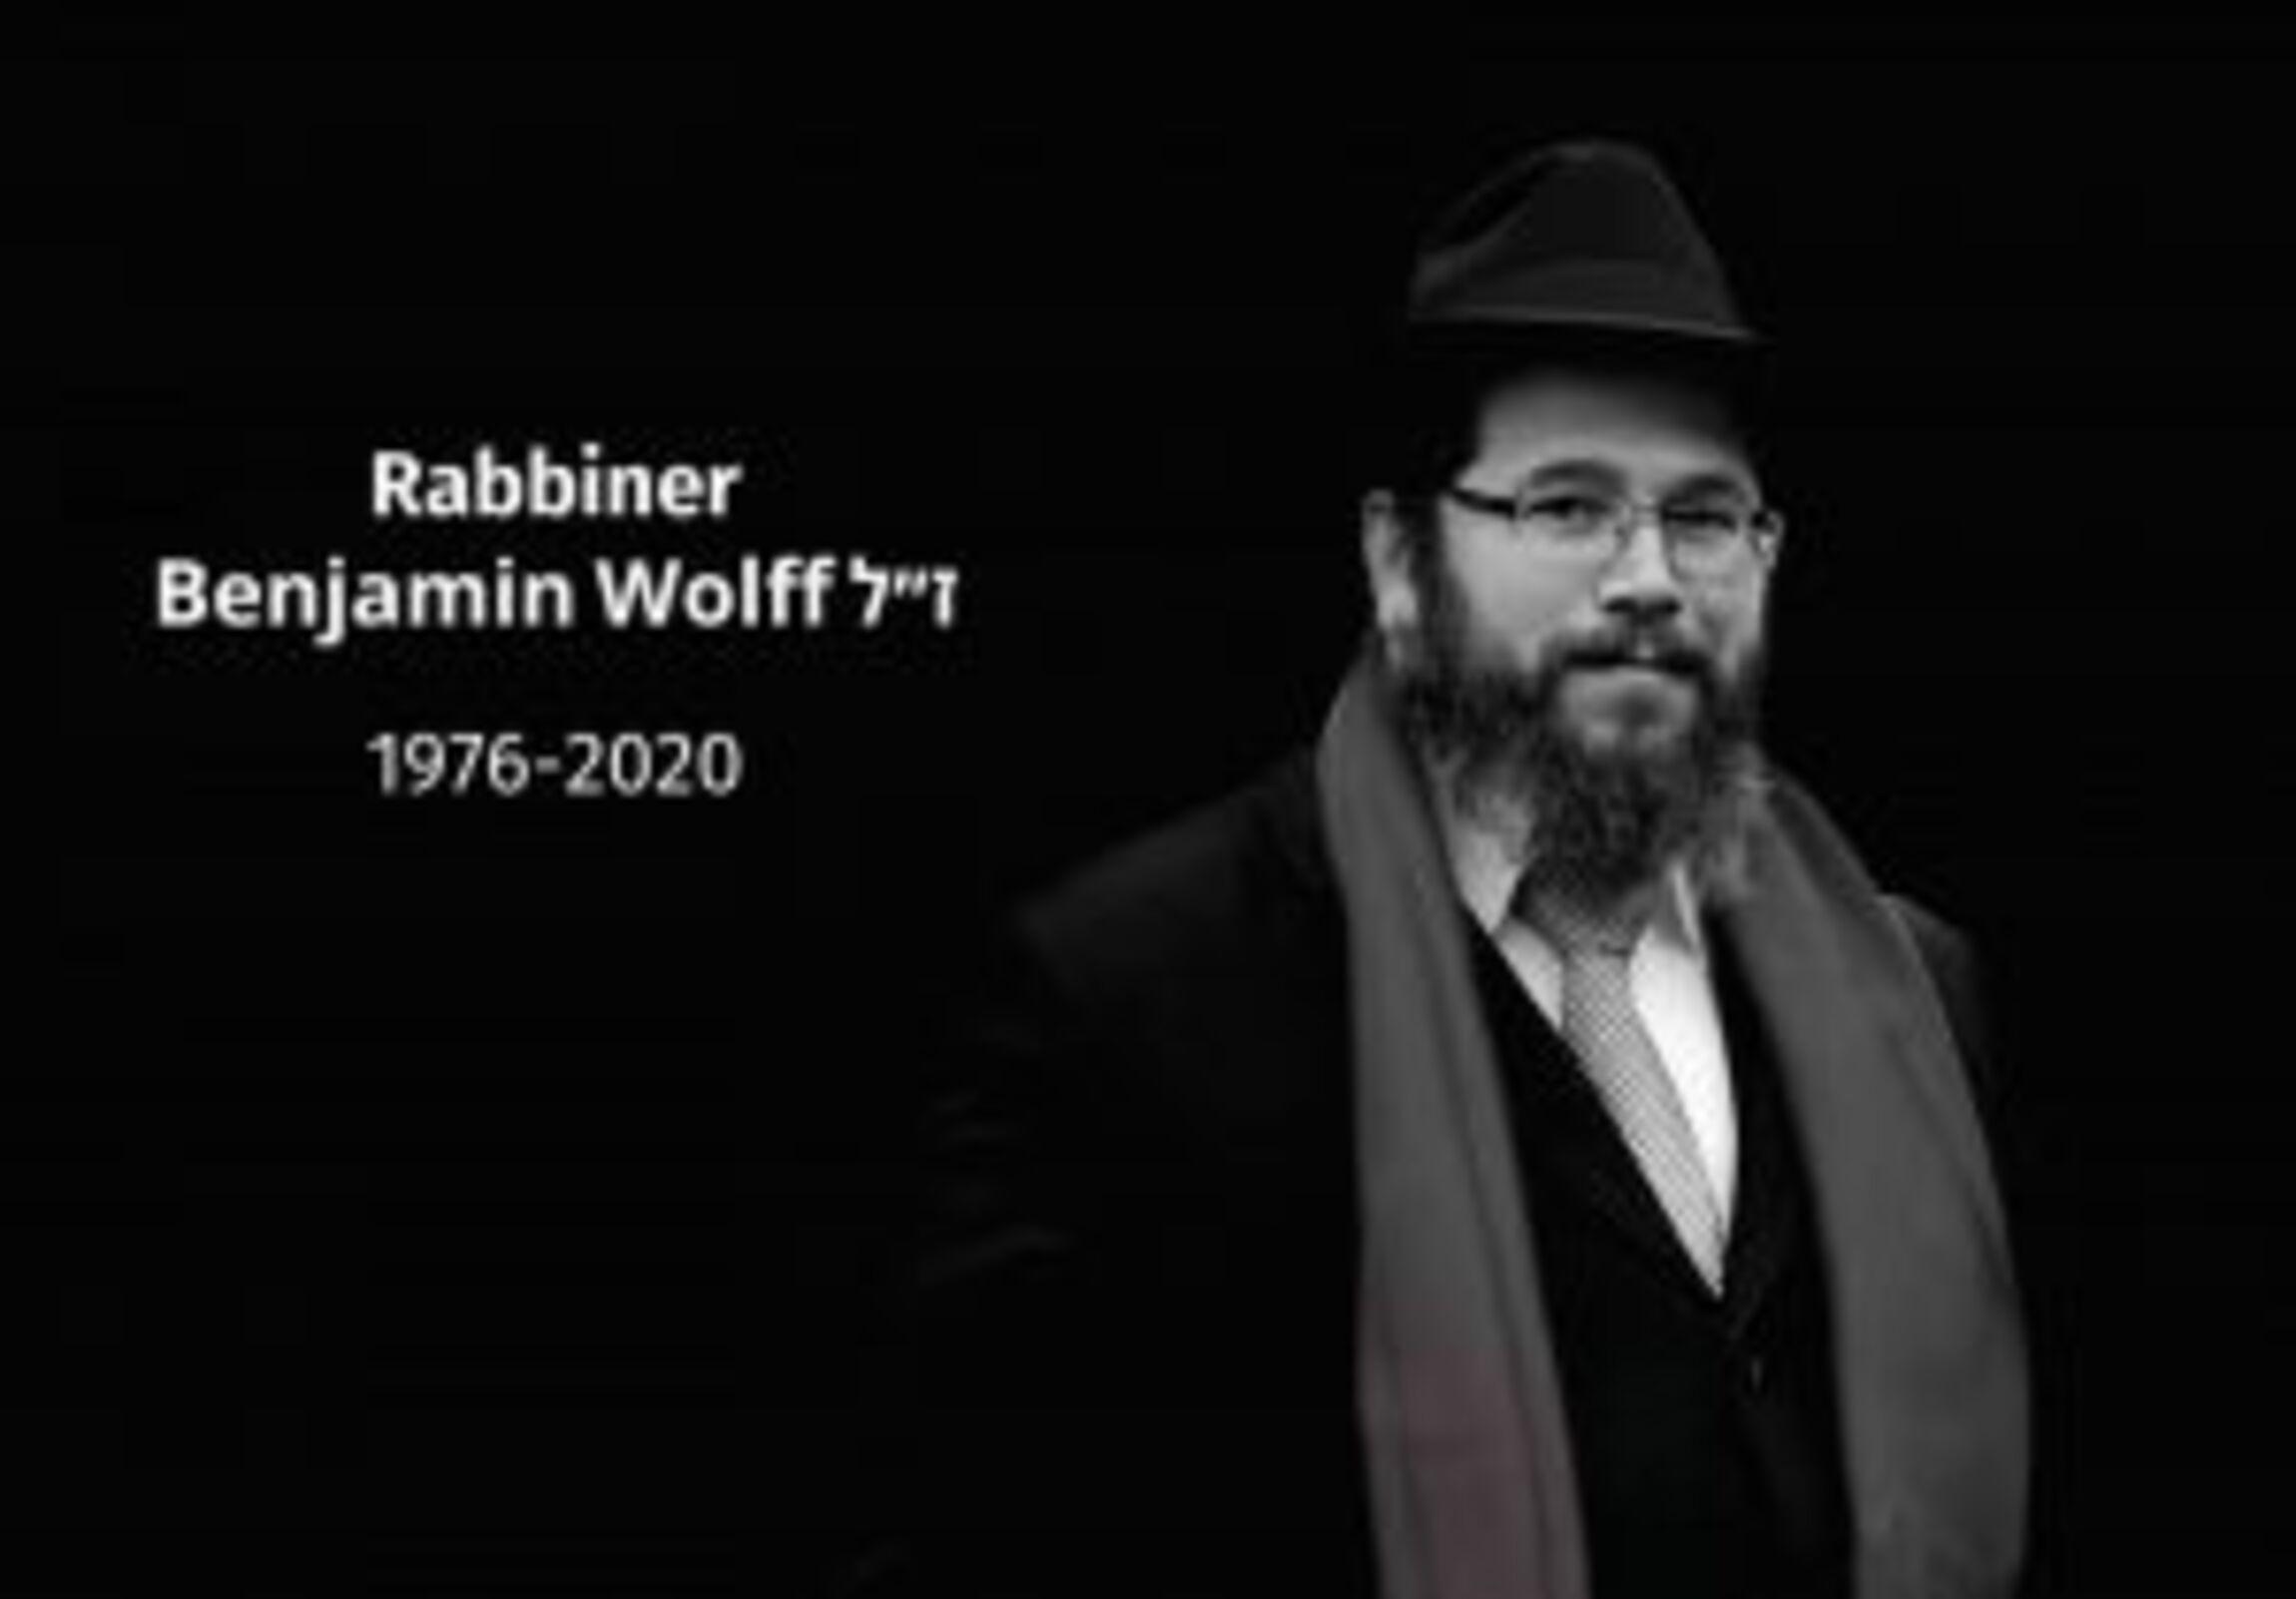 Rabbiner Benjamin Wolff